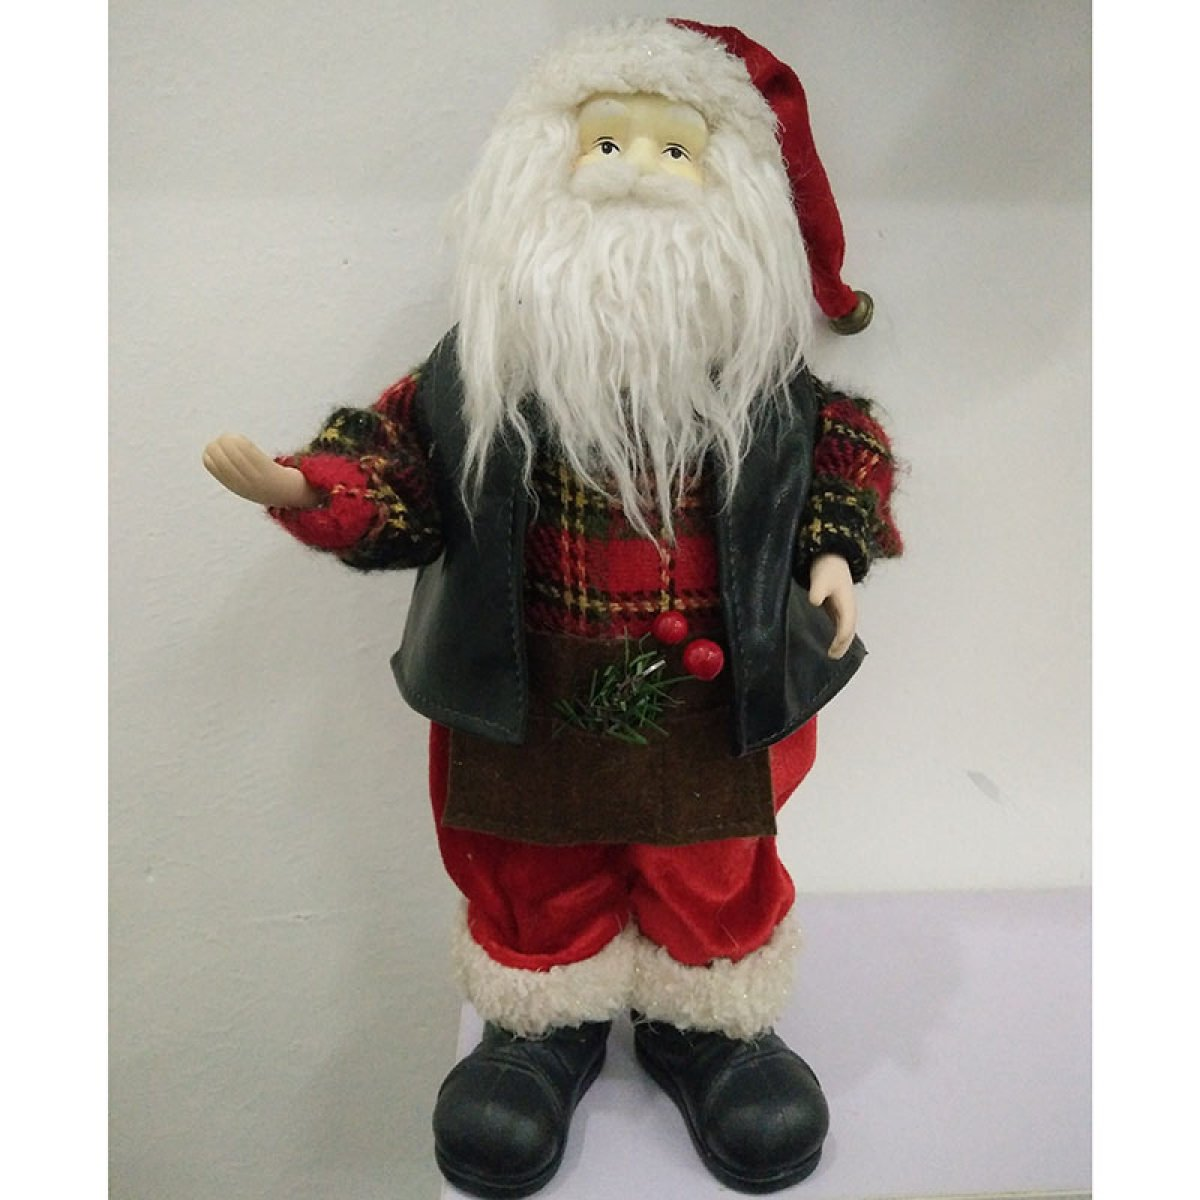 GAOQIANG Santa Claus Doll Plush Toy Doll Gift Decoration Holiday Christmas Gift Niña De Los Niños